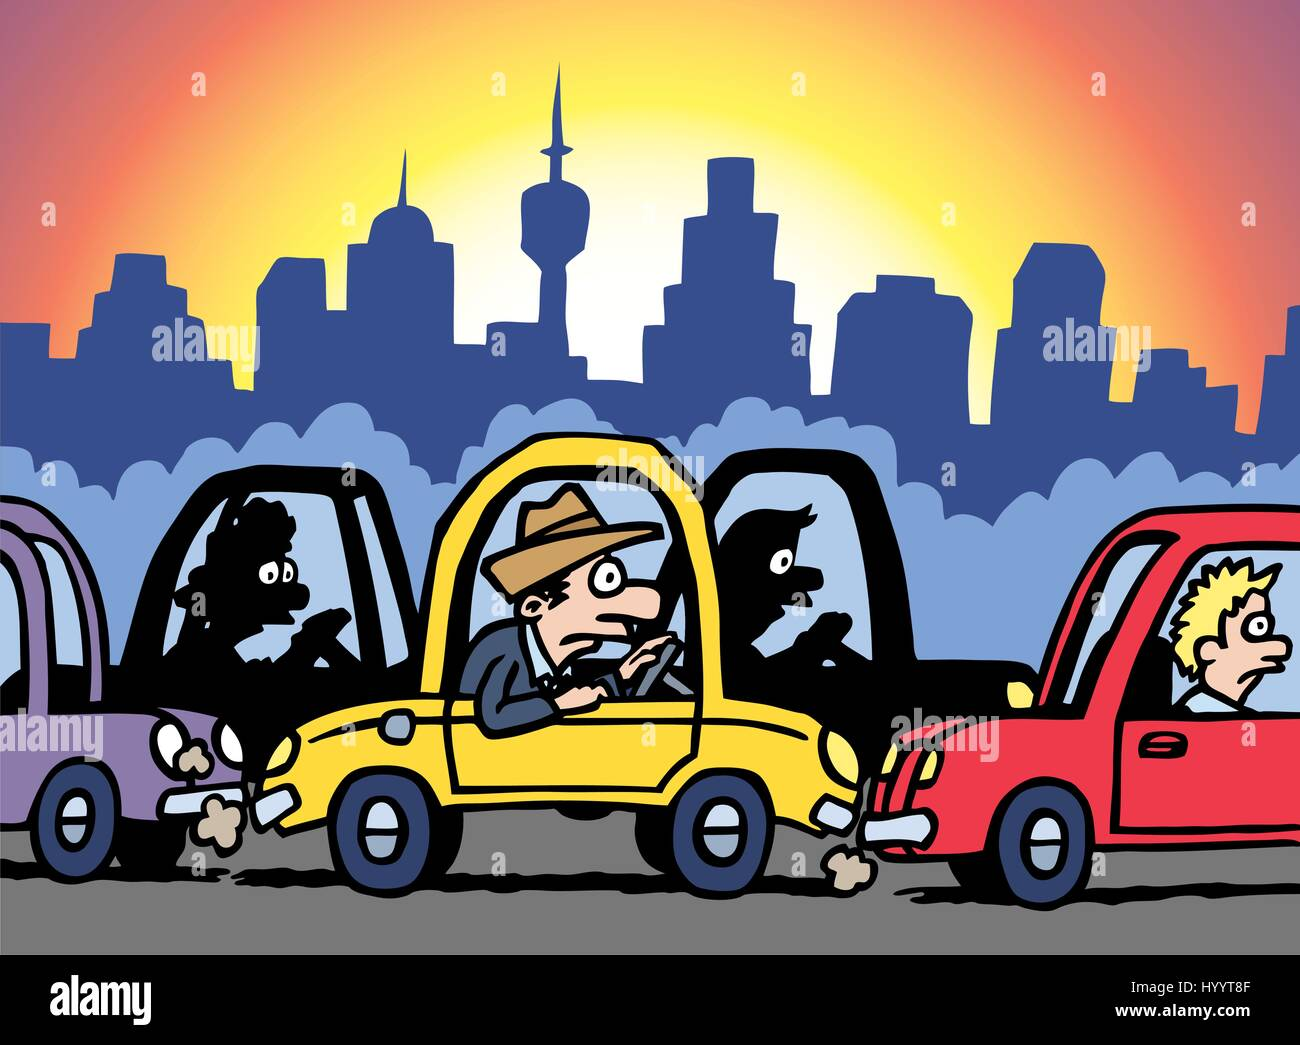 Traffic Jam Man Stuck In Car Vector Illustration Stock Vector Image Art Alamy